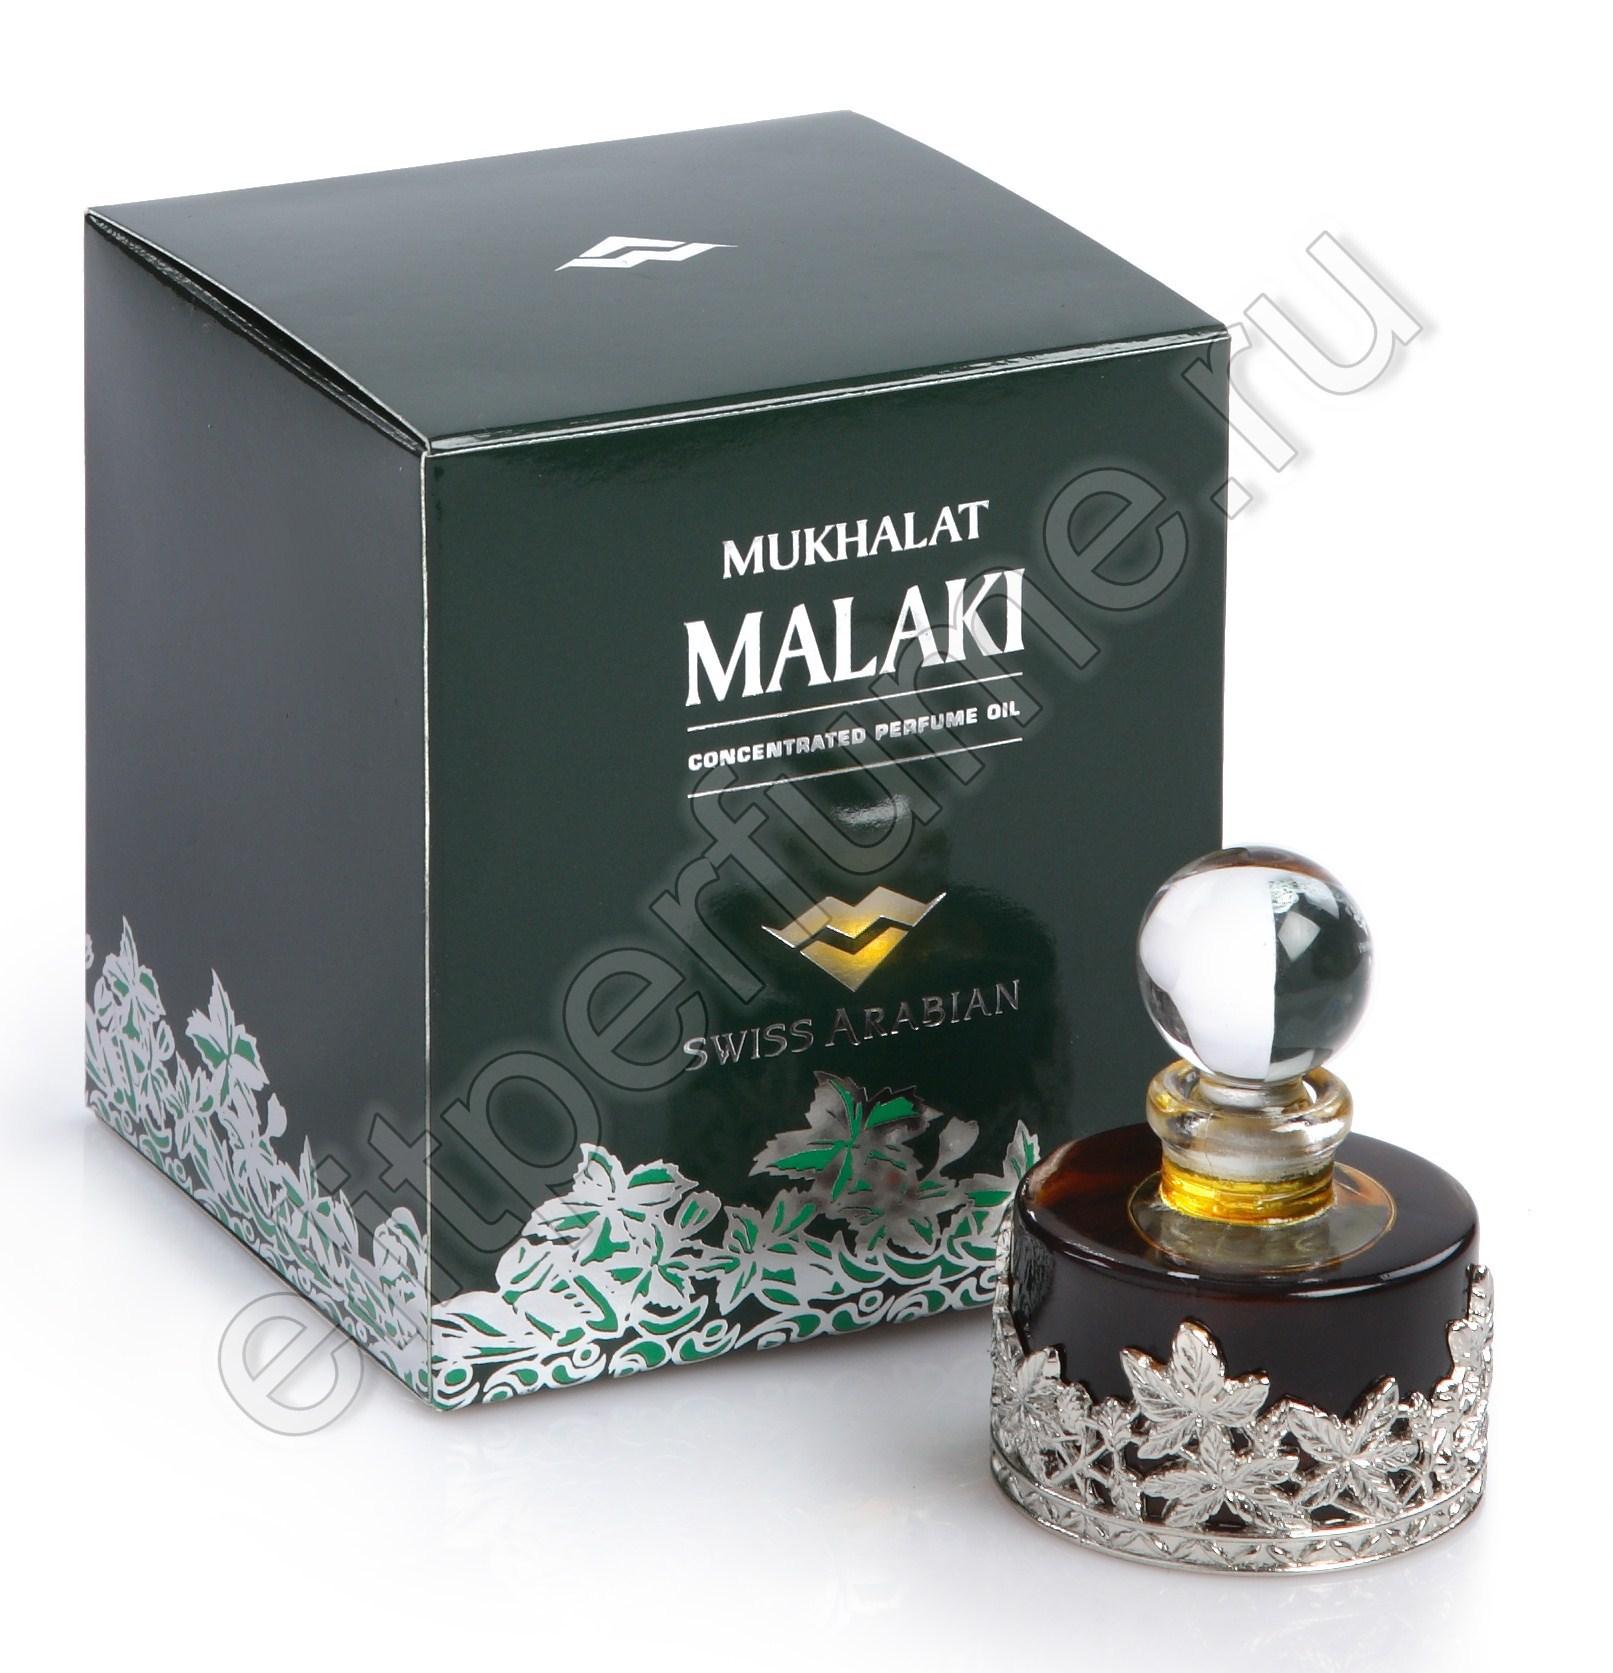 Мухаллат Малаки Mukhalat Malaki 30 мл арабские мужские масляные духи от Свисс Арабиан Swiss Arabian